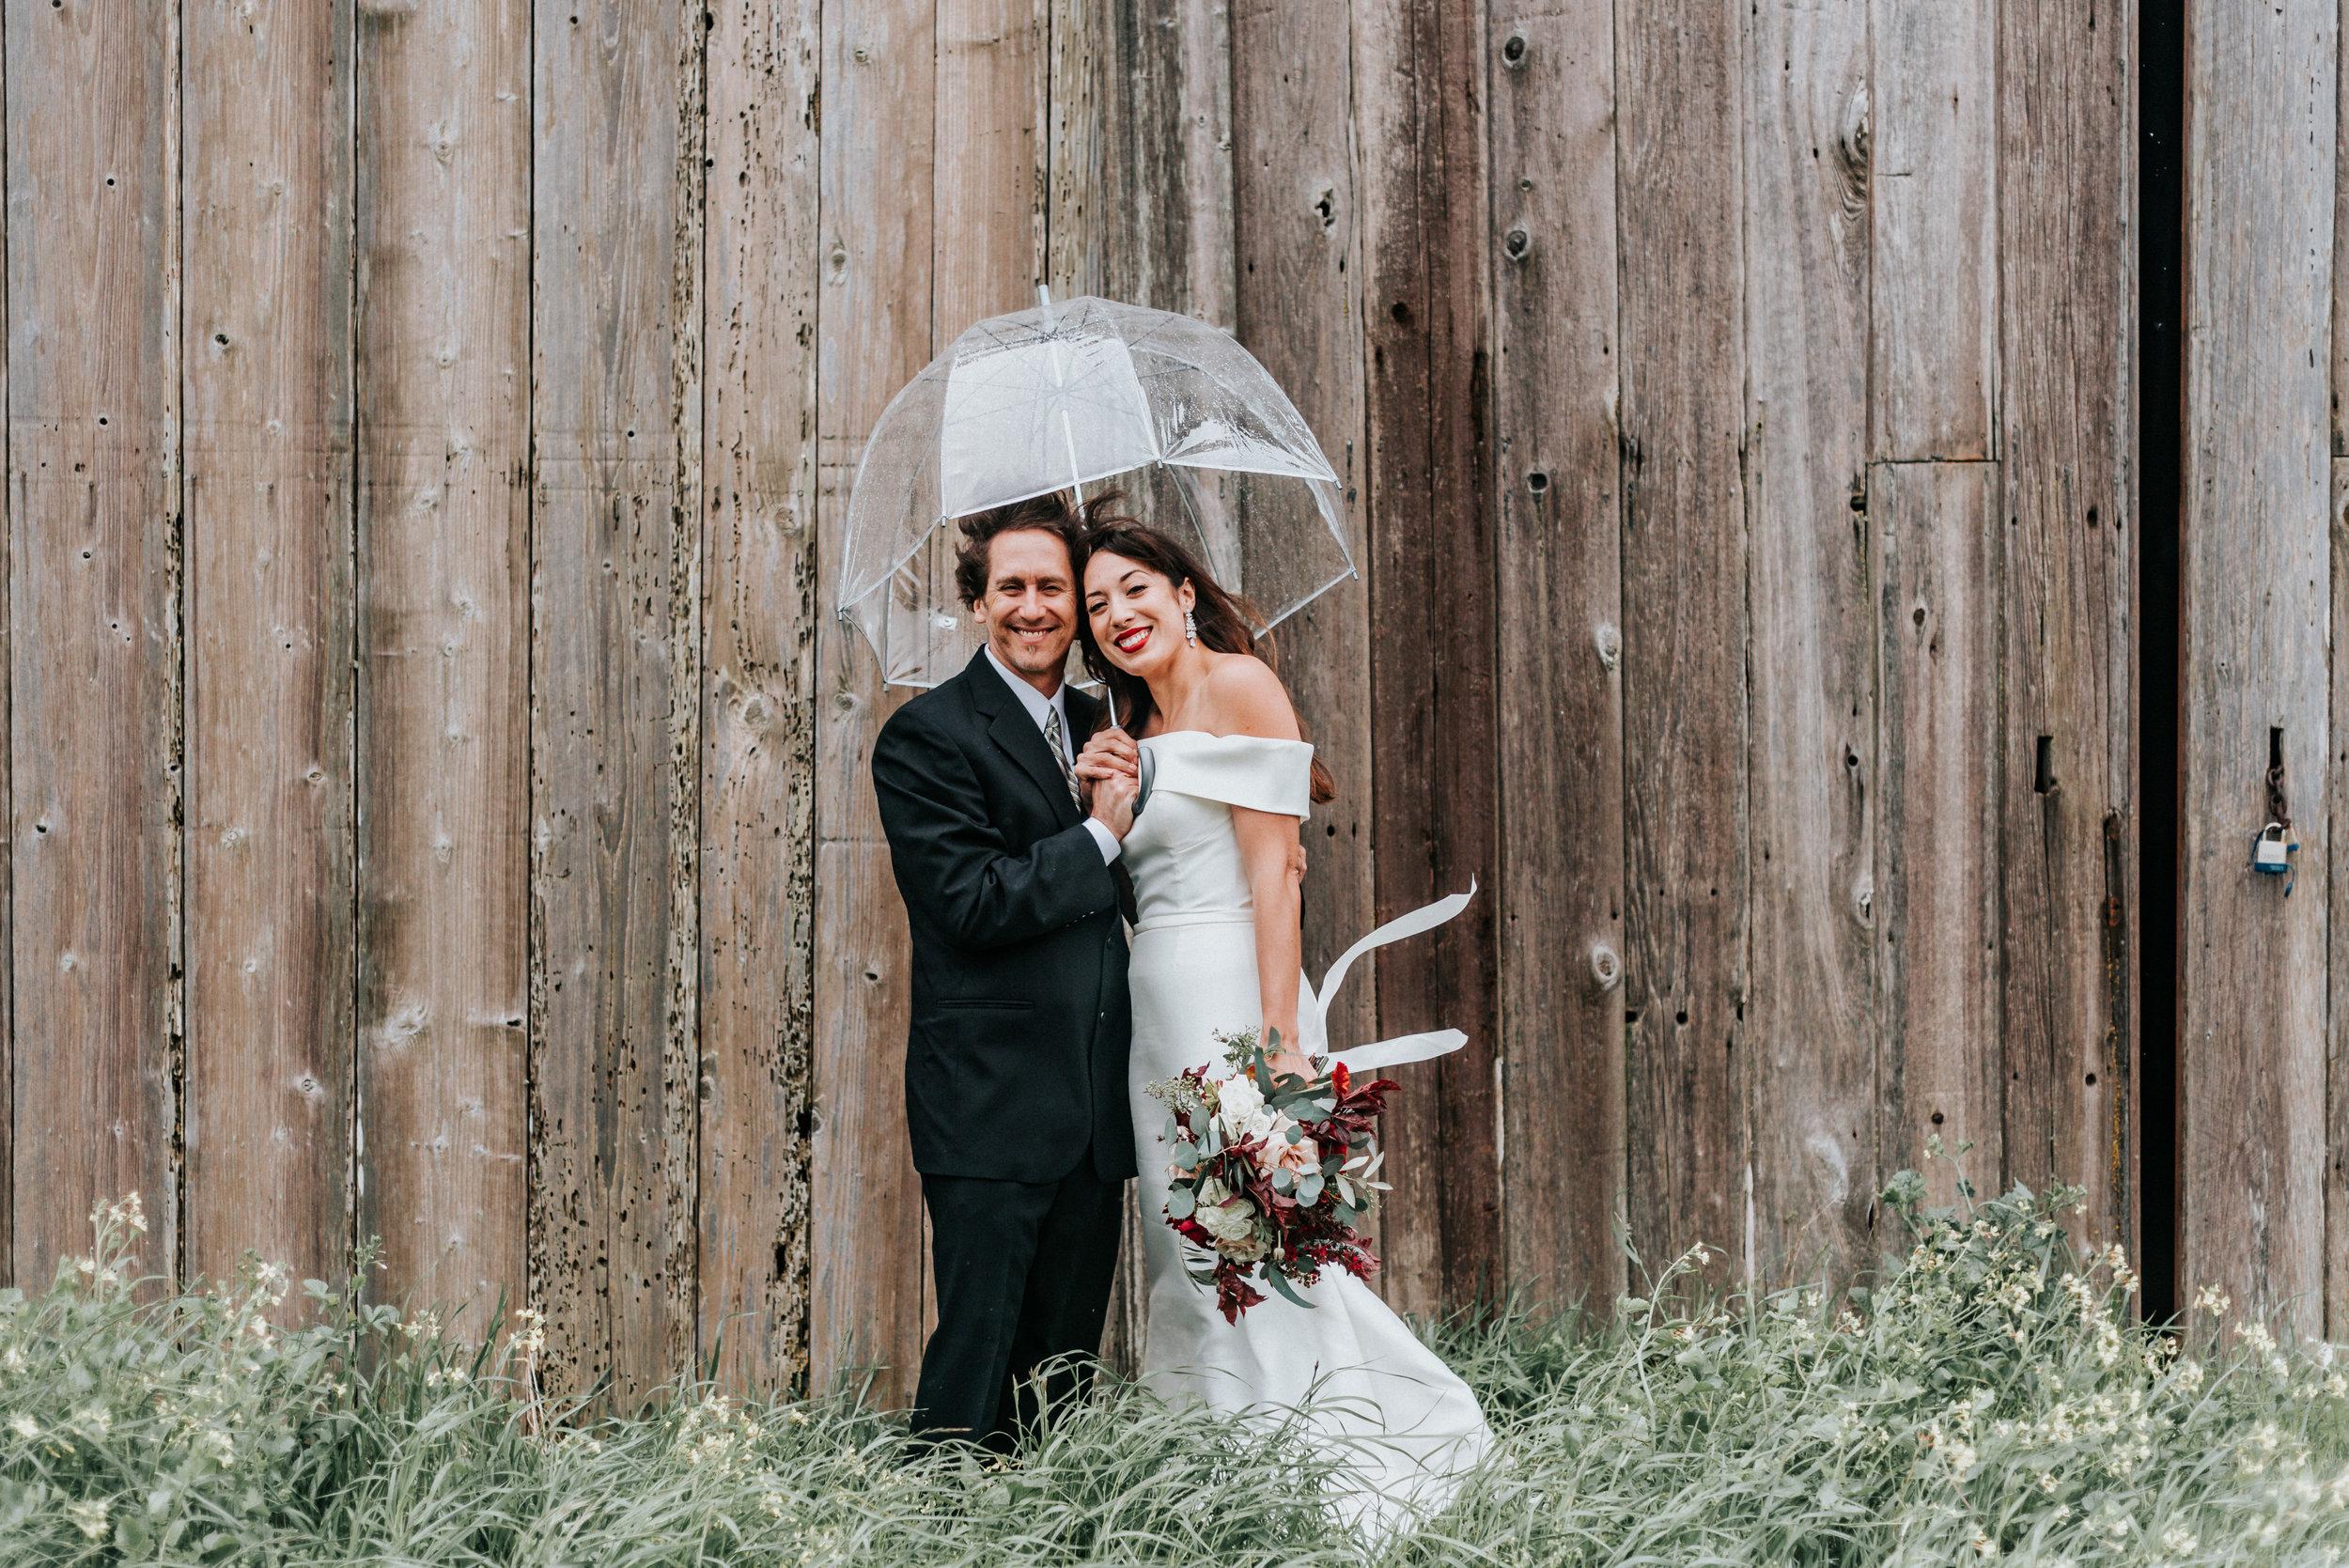 Albion River Inn Wedding in Albion Caliornia-9.jpg